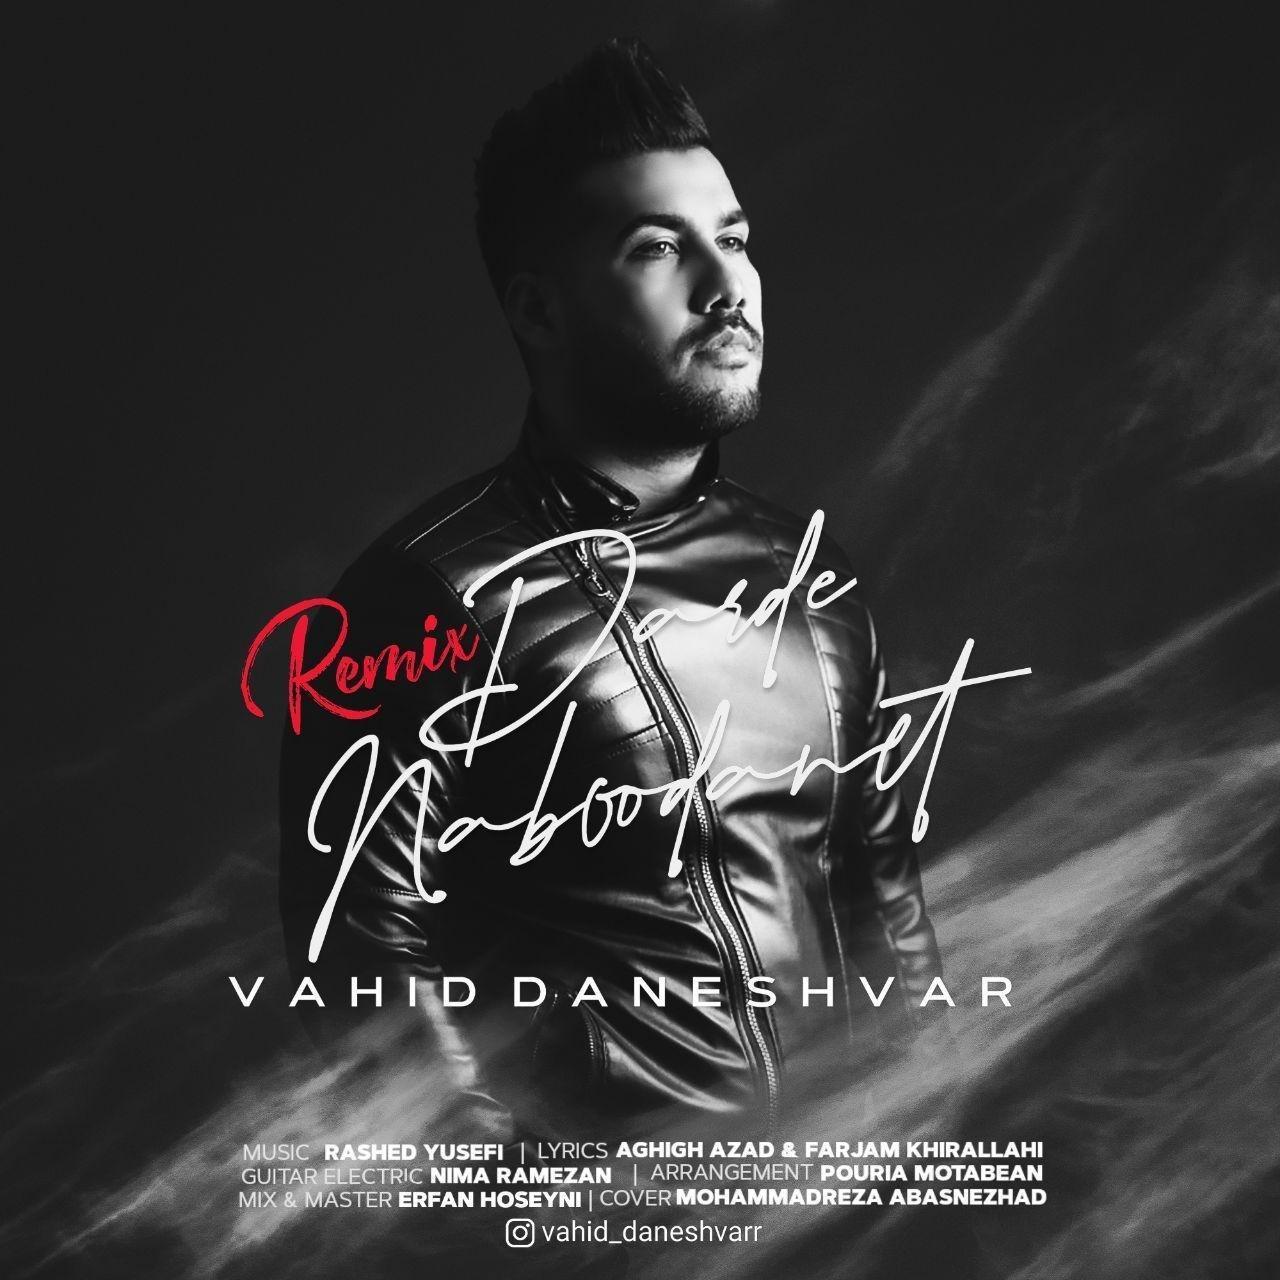 Vahid Daneshvar – Darde Naboodanet (Remix)